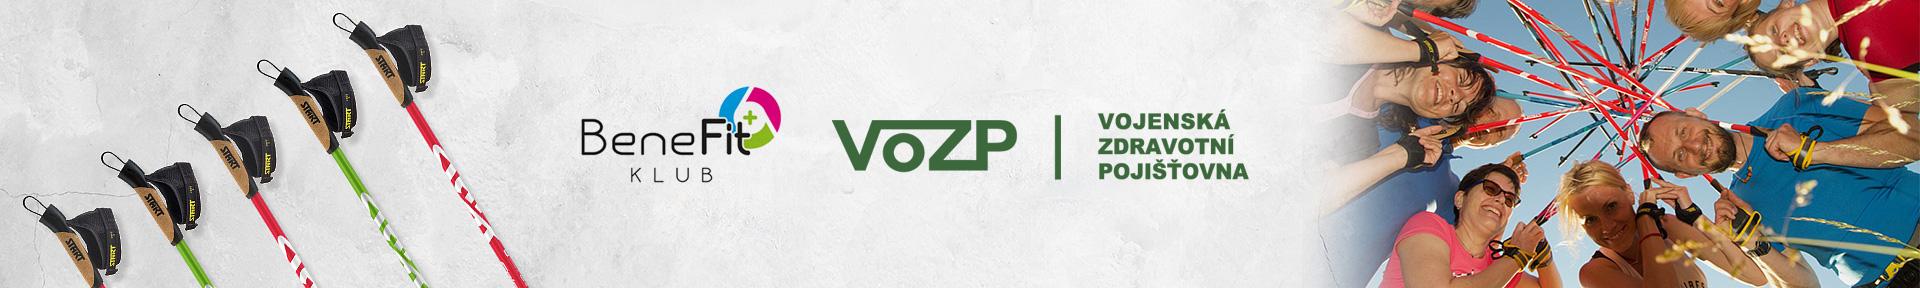 vozp_banner